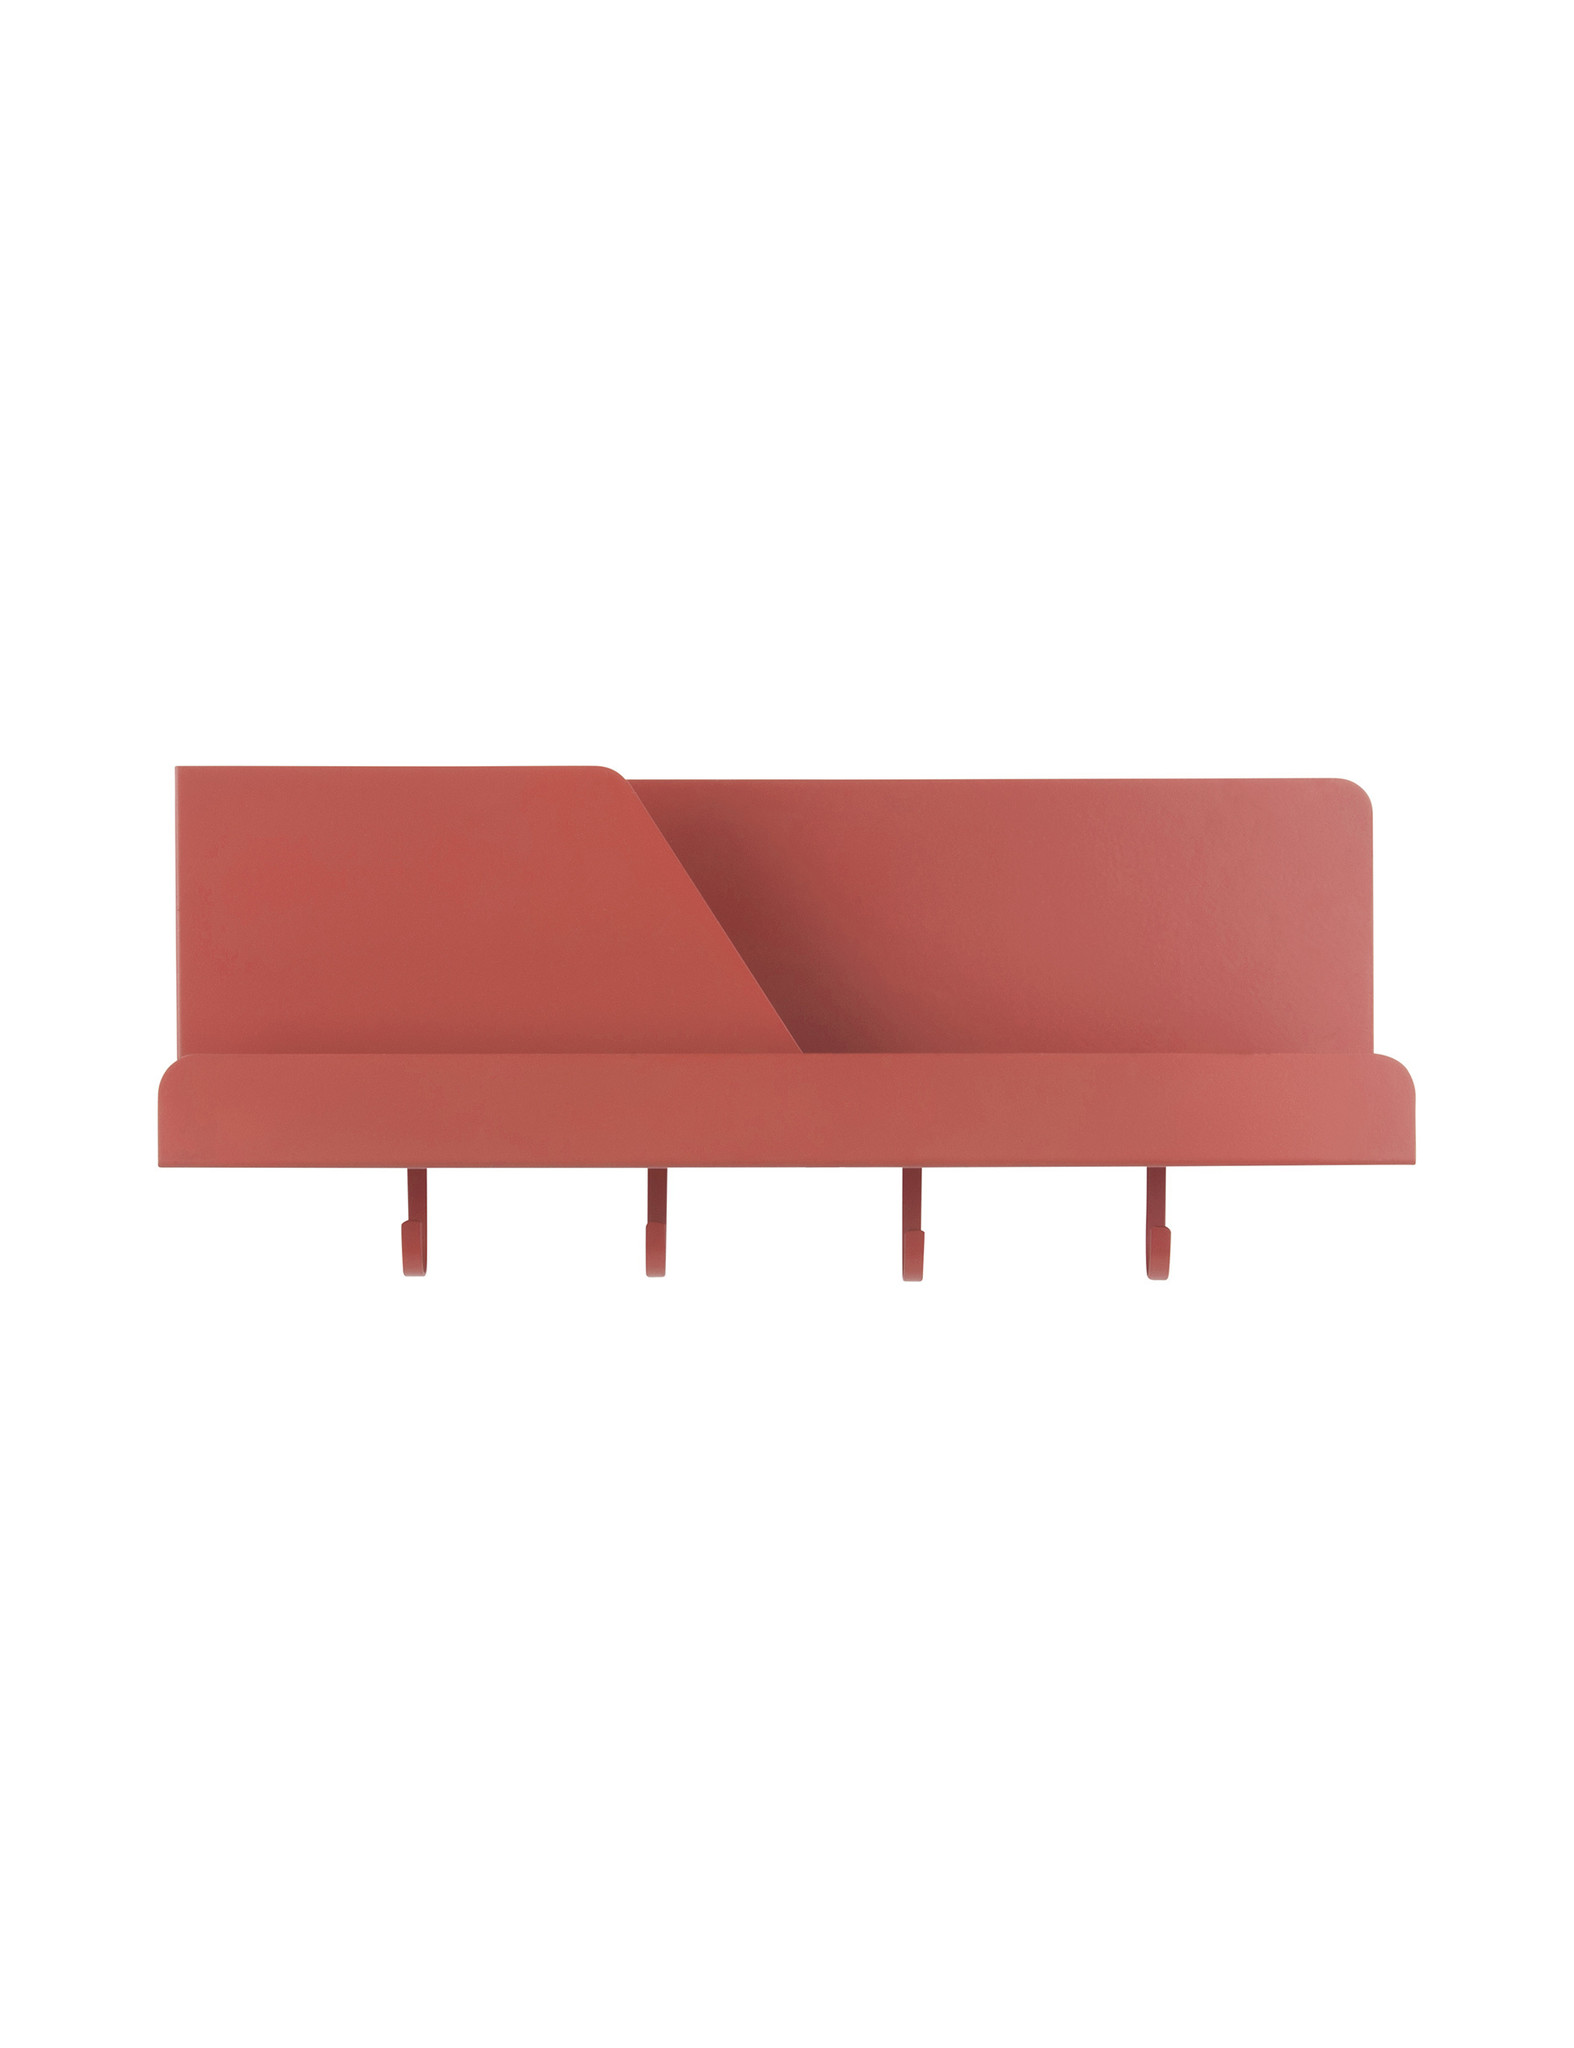 Prachtige roodbruine wall organizer - Present Time